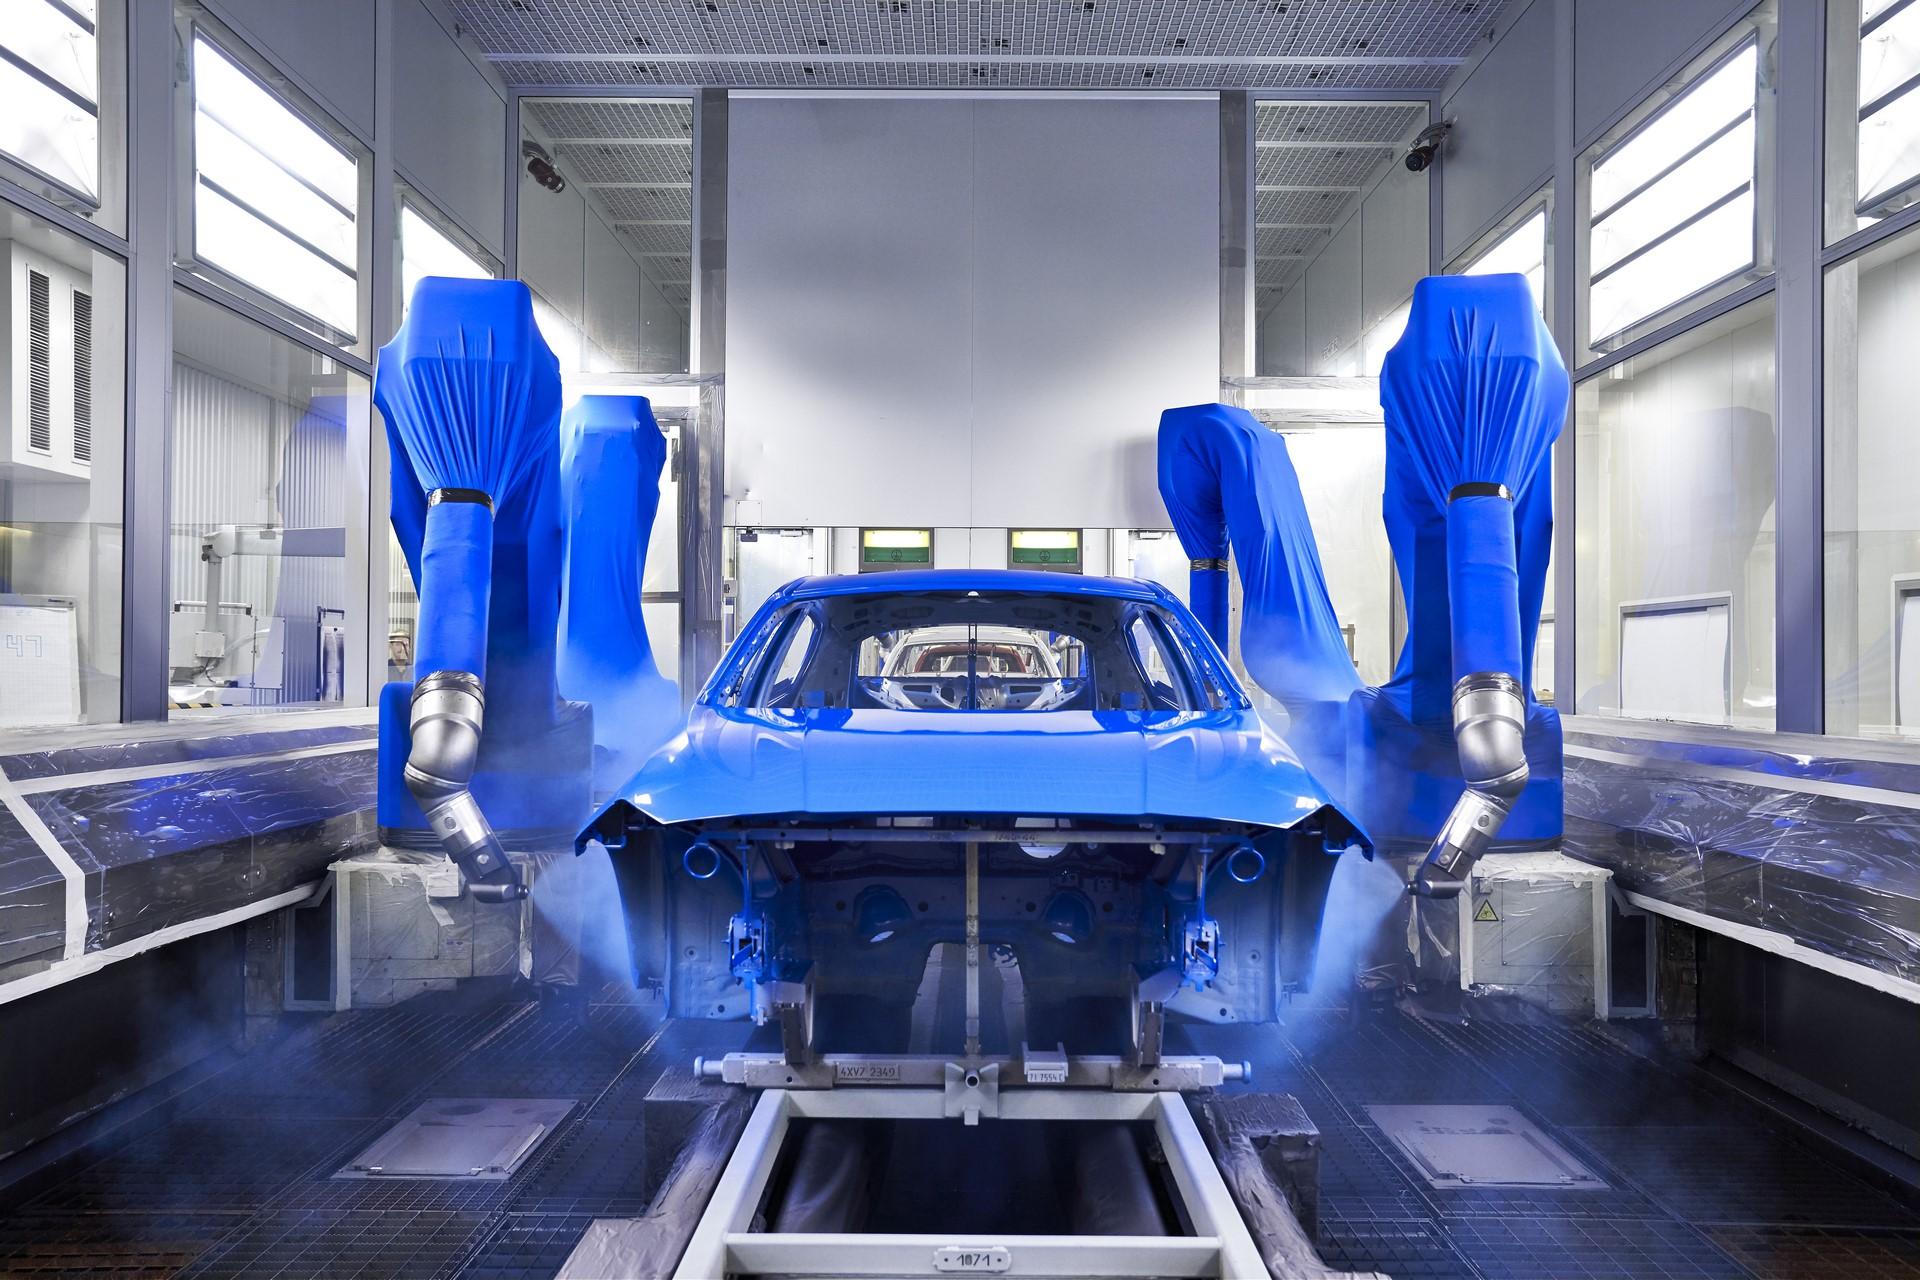 BMW-1-Series-production-plant-starts-6